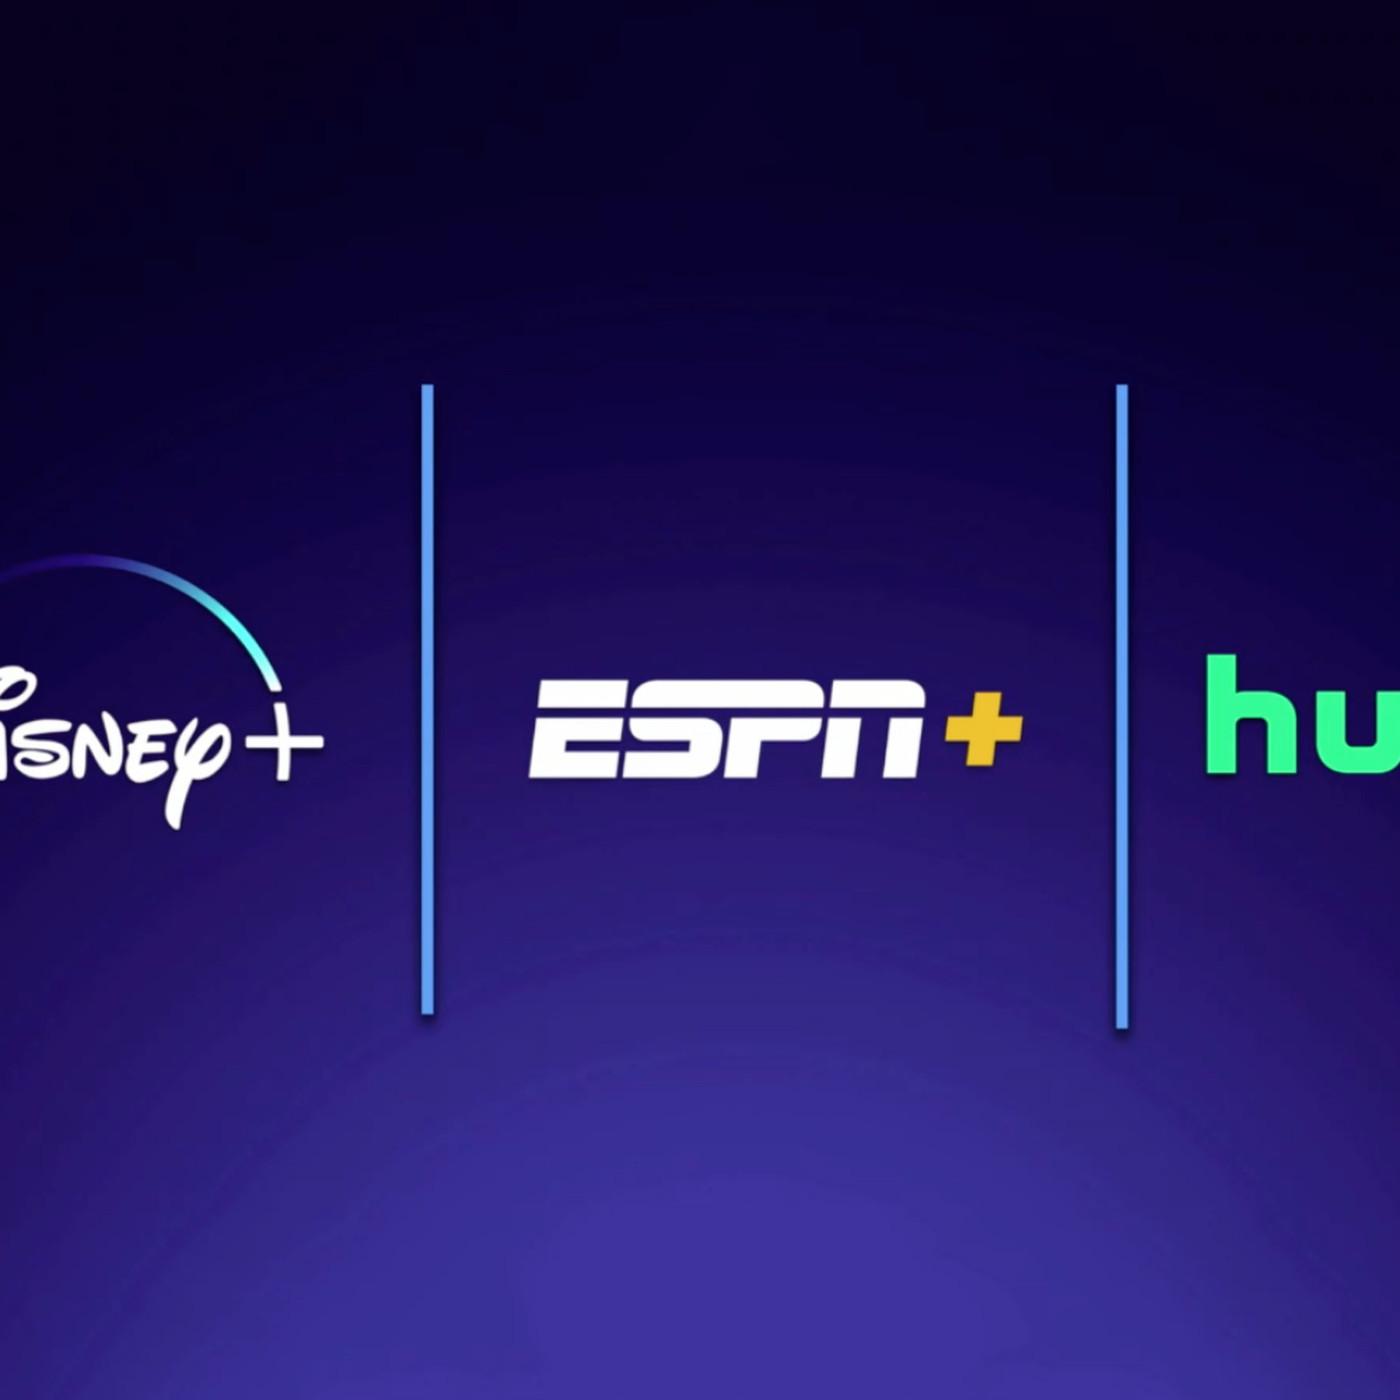 Disney Announces 12 99 Bundle For Disney Hulu And Espn The Verge